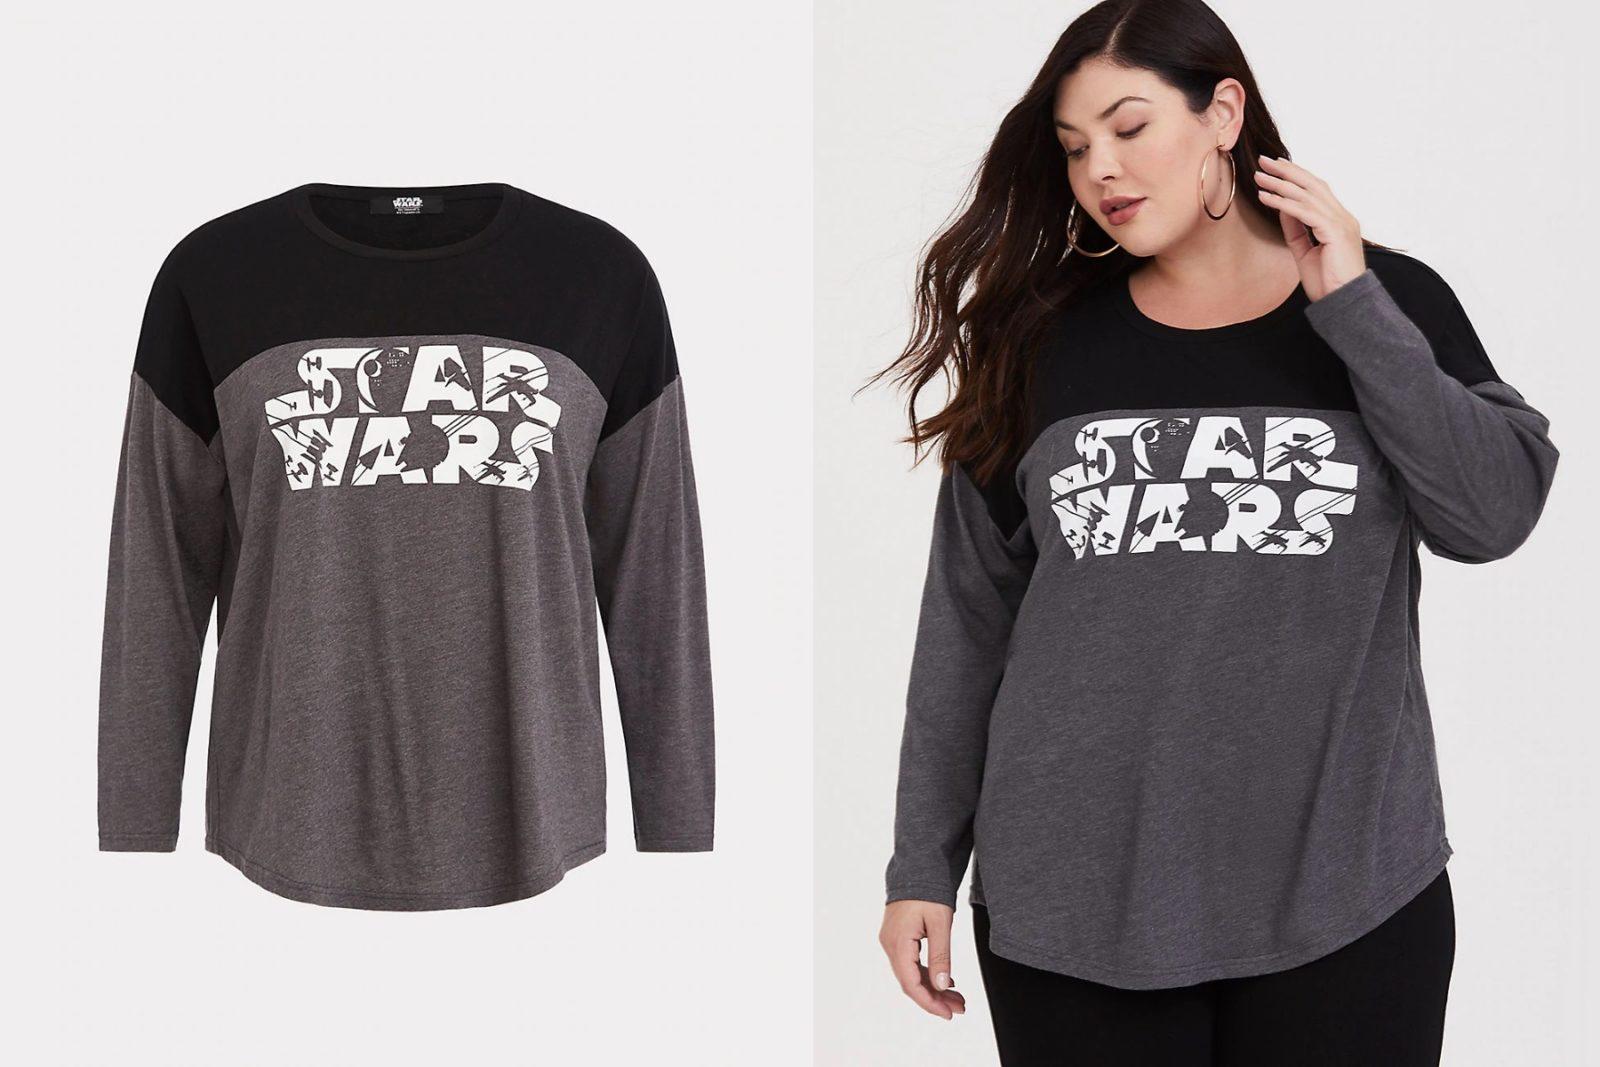 Her Universe Star Wars Plus Size Top at Torrid